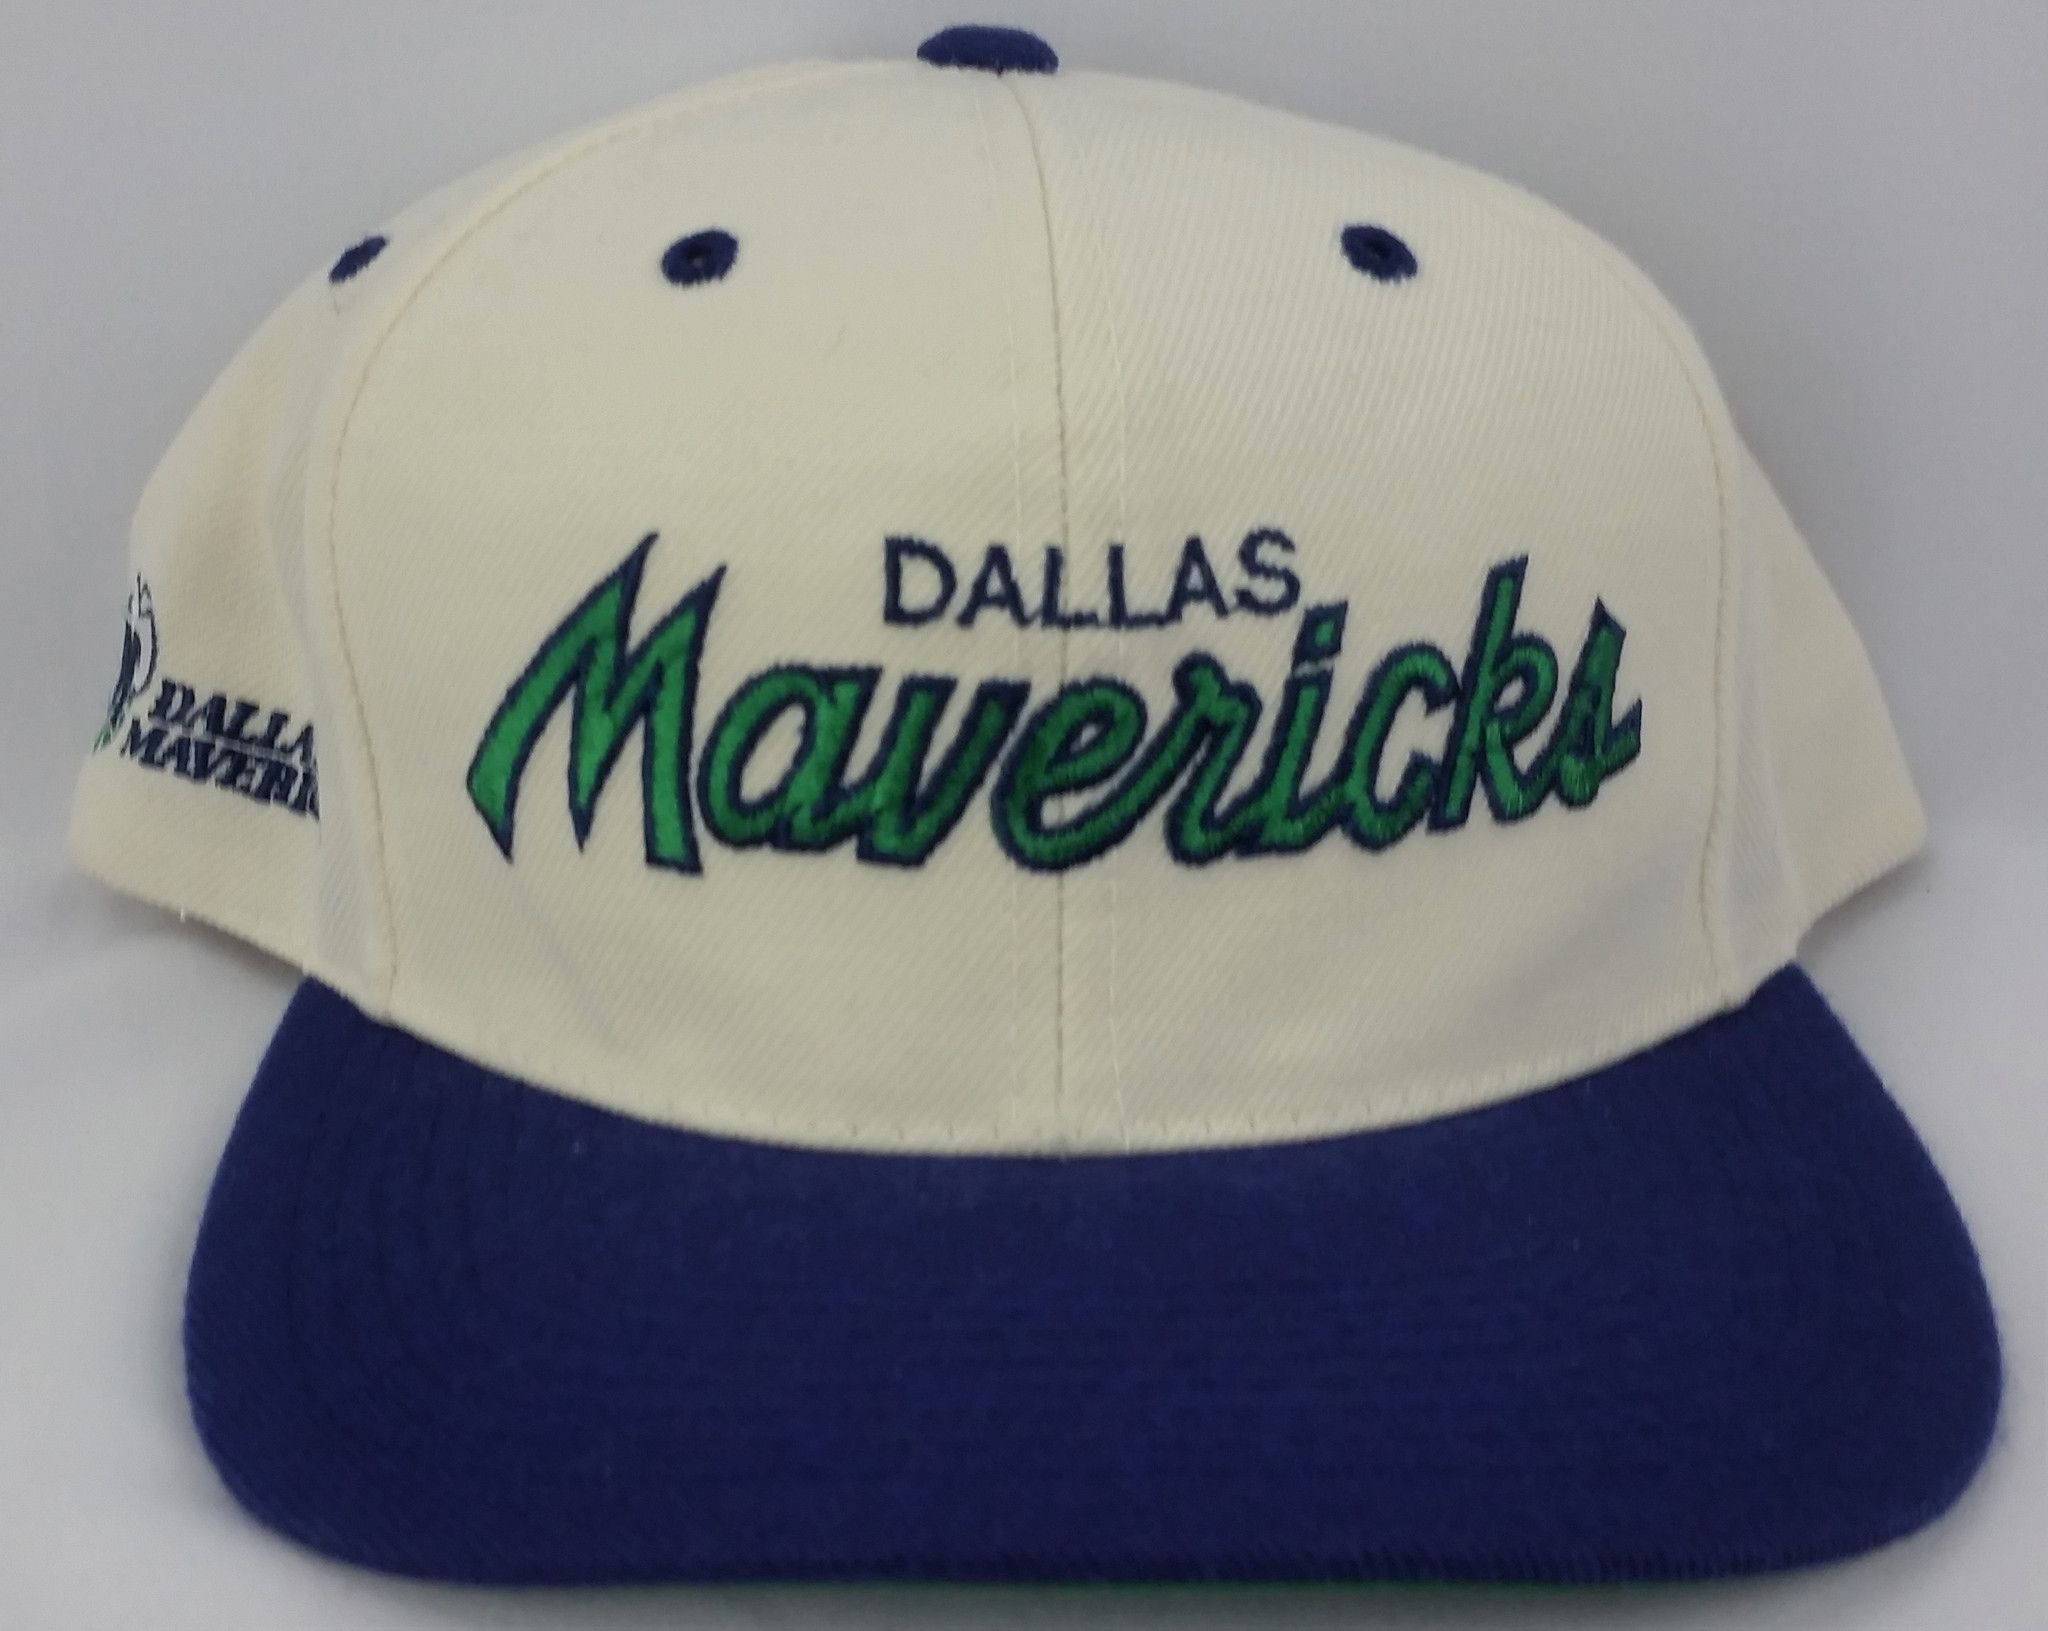 huge discount f1ebf 1a045 Dallas Mavericks Vintage Snapback Sports Specialties Script Hat NBA Wool  Rare Cap